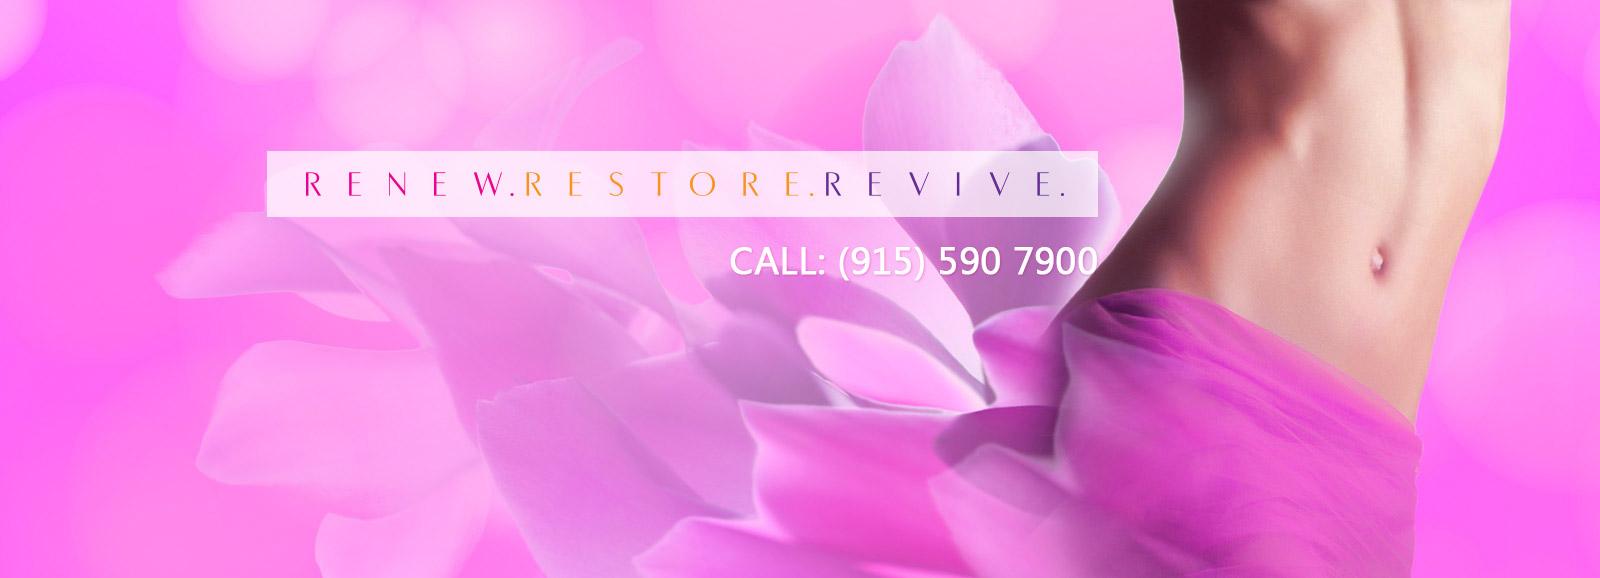 RENEW. RESTORE. REVIVE. CALL 915-590-7900